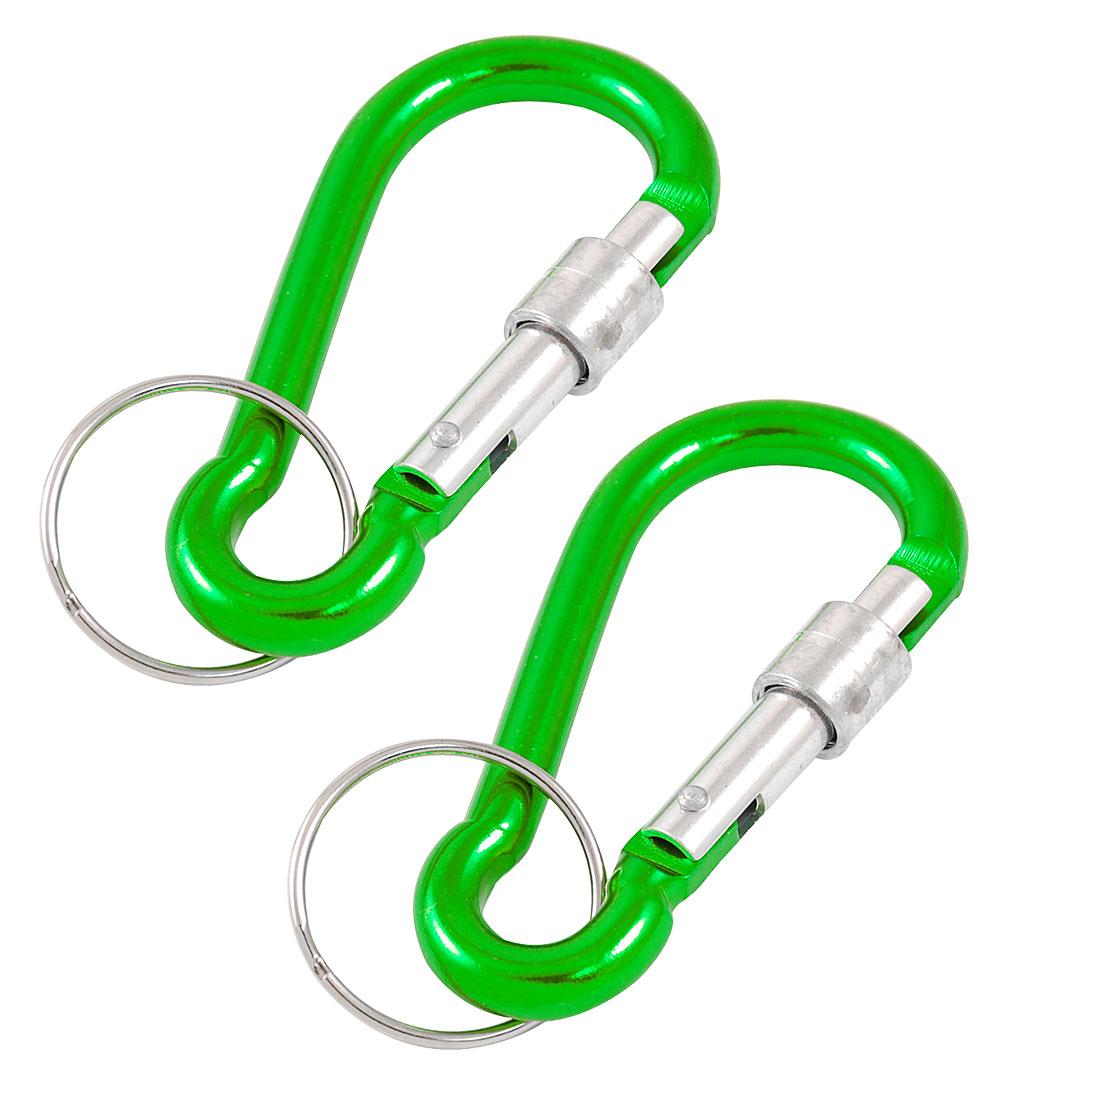 Water Bottle Holder Green Aluminum D Shaped Lock Gate Keyring Carabiner 2pcs